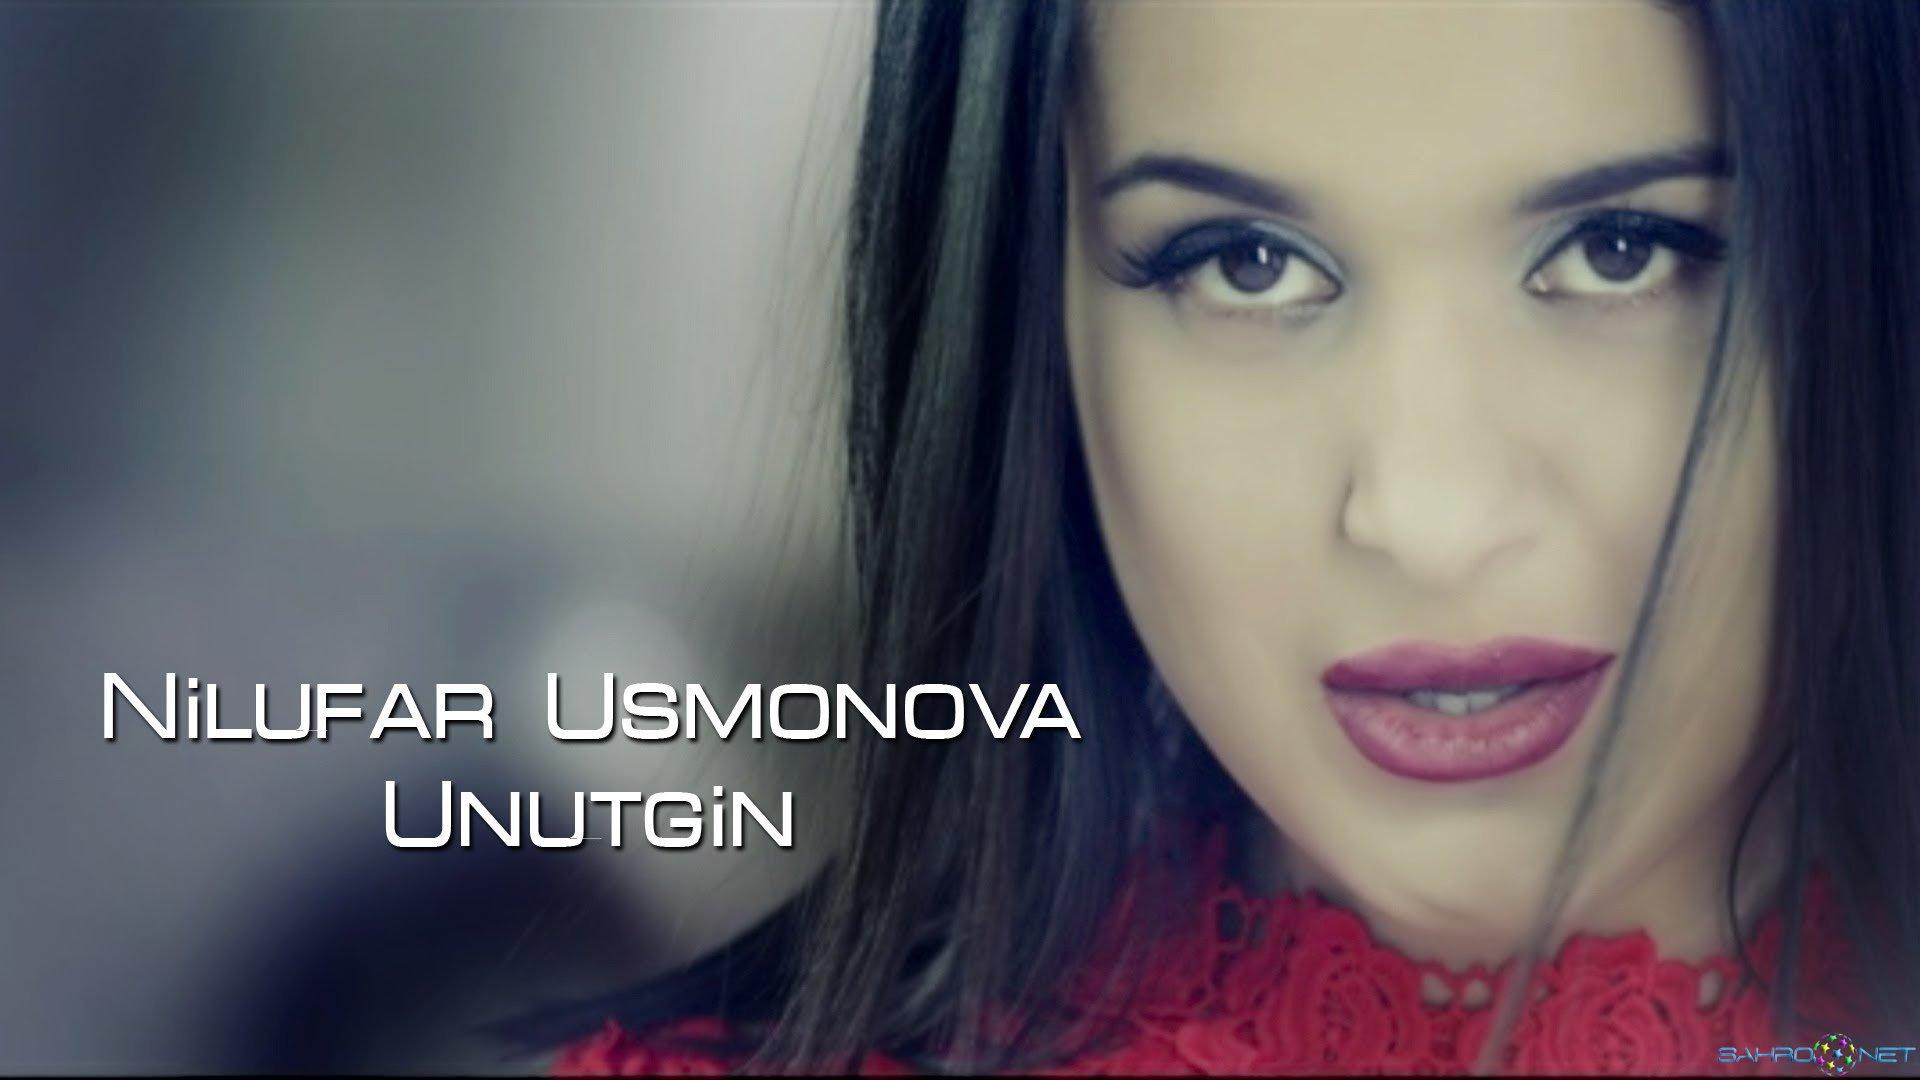 Nilufar Usmonova, nouveauté ouzbèke dans Ouzbékistan 1391258782_nilufar-usmonova-unutgin